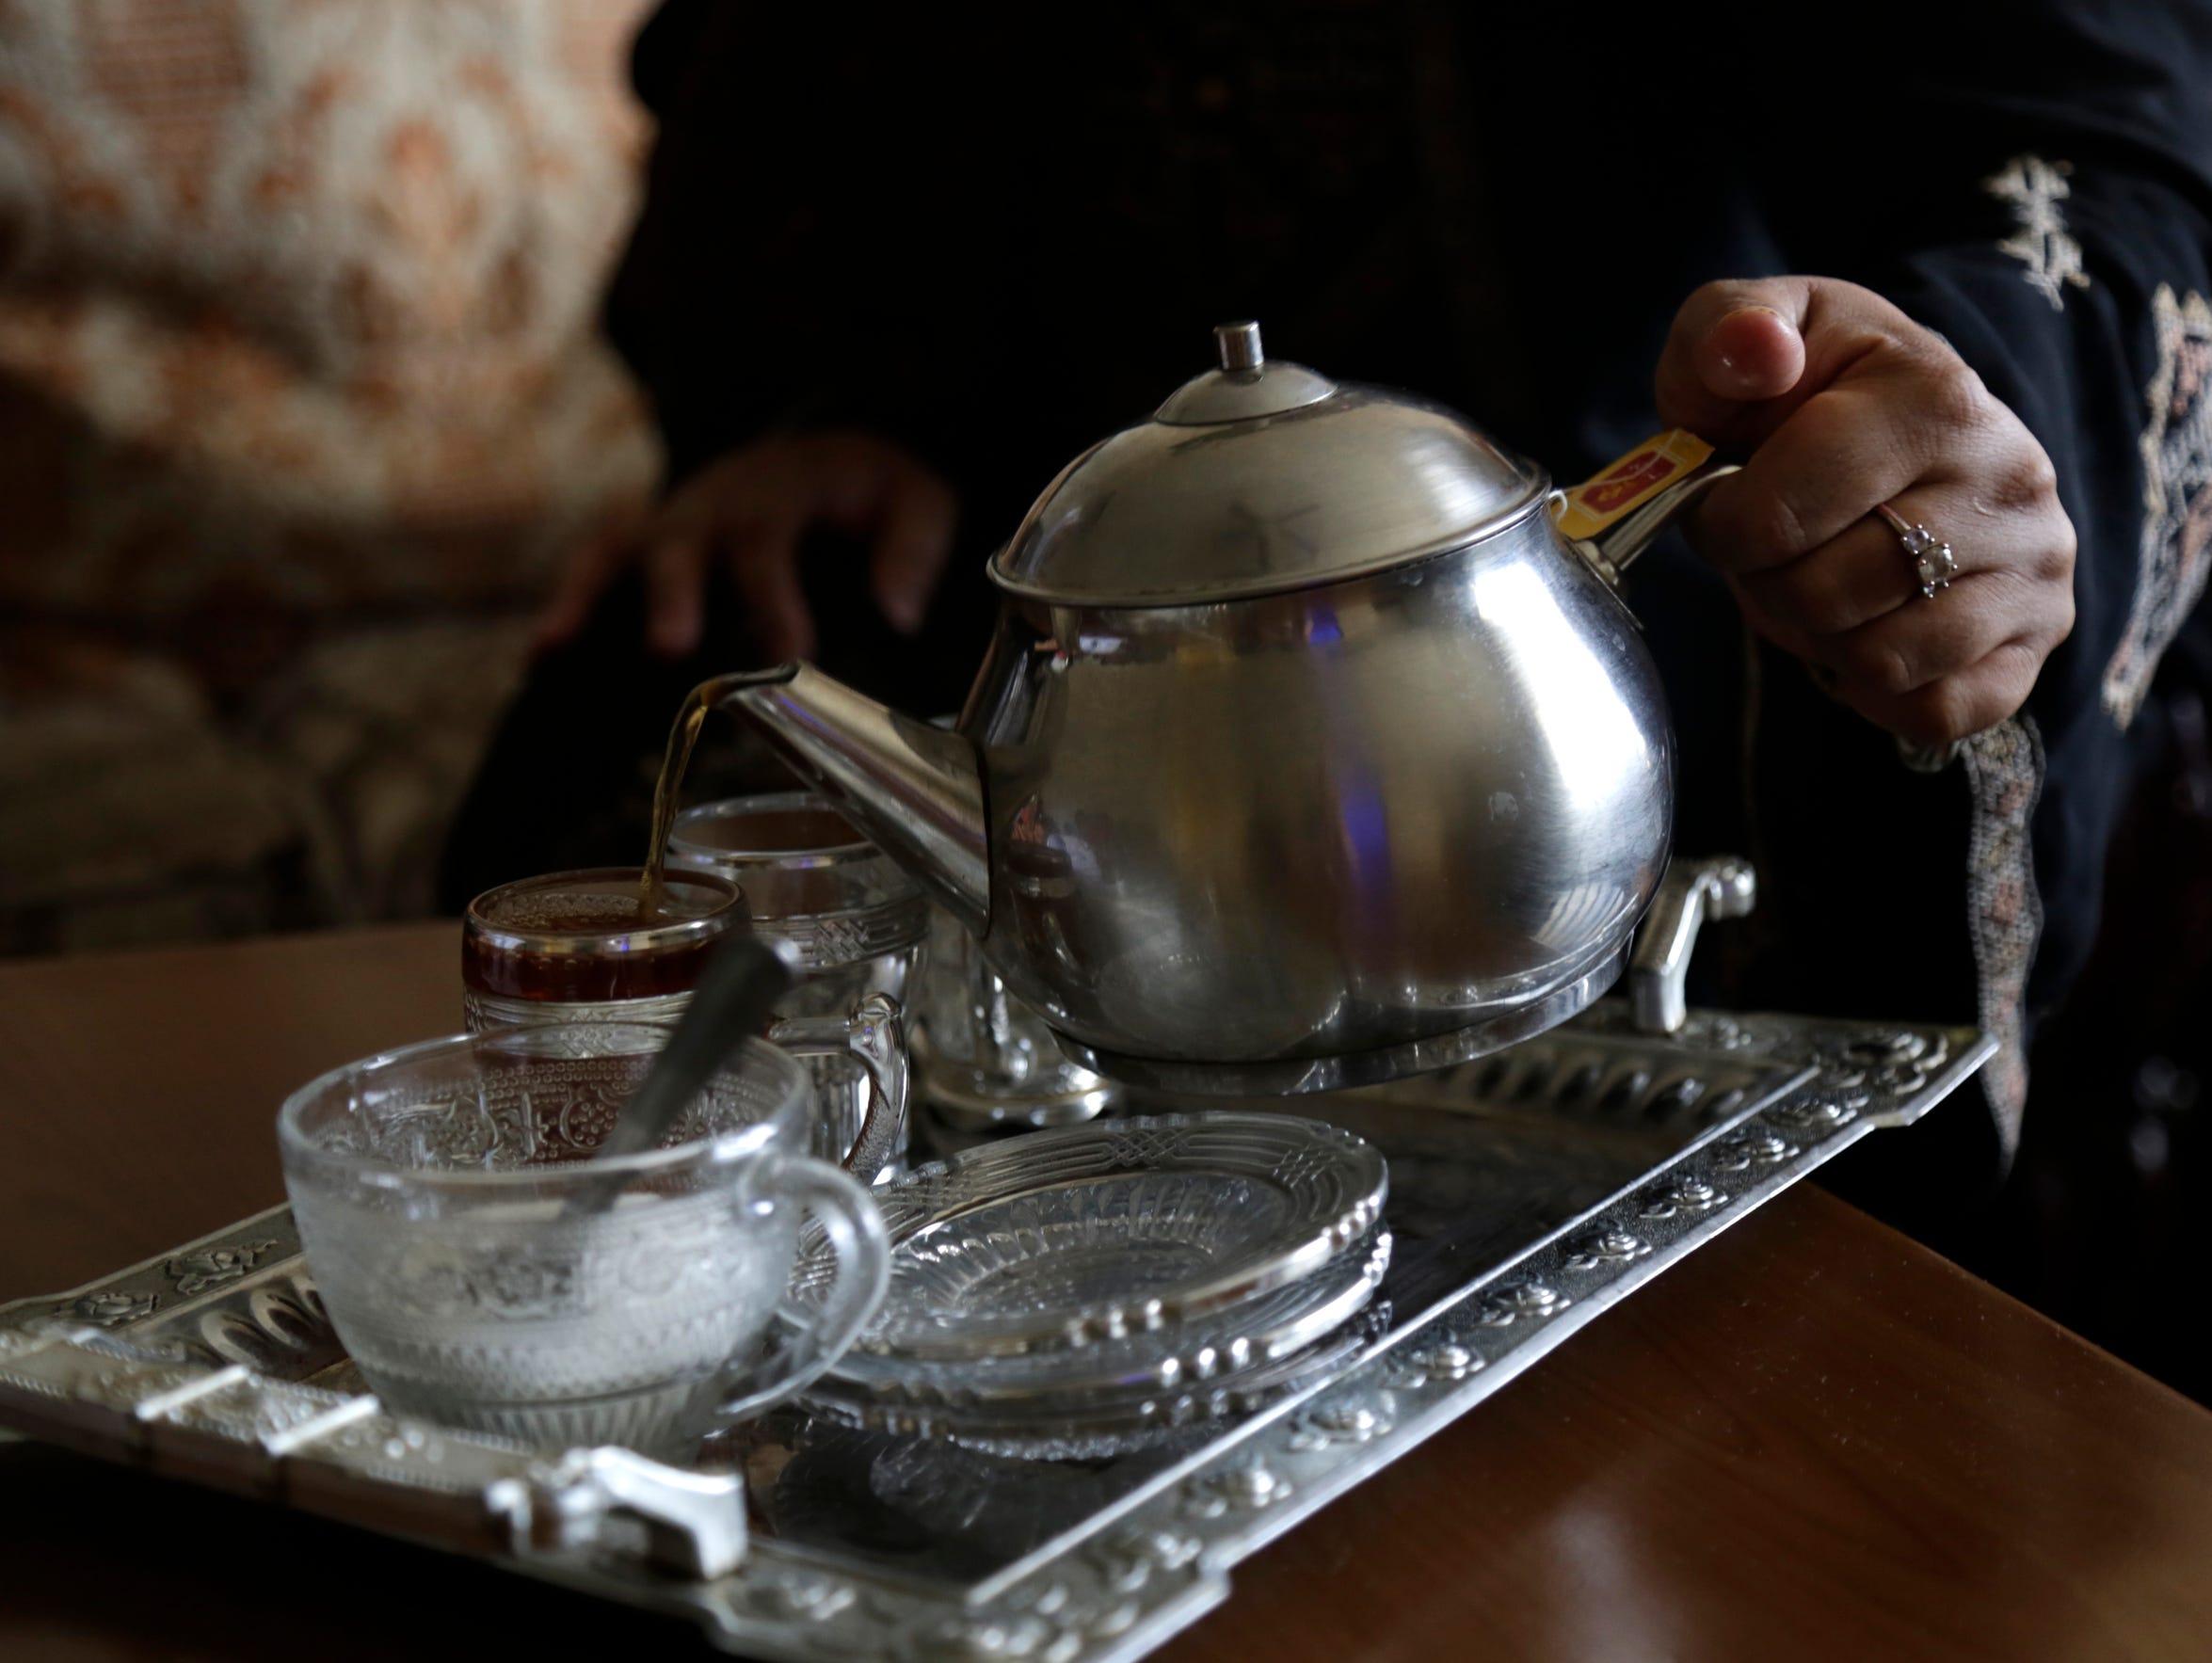 Rasha Almasri pours a cup of cardamom scented tea at